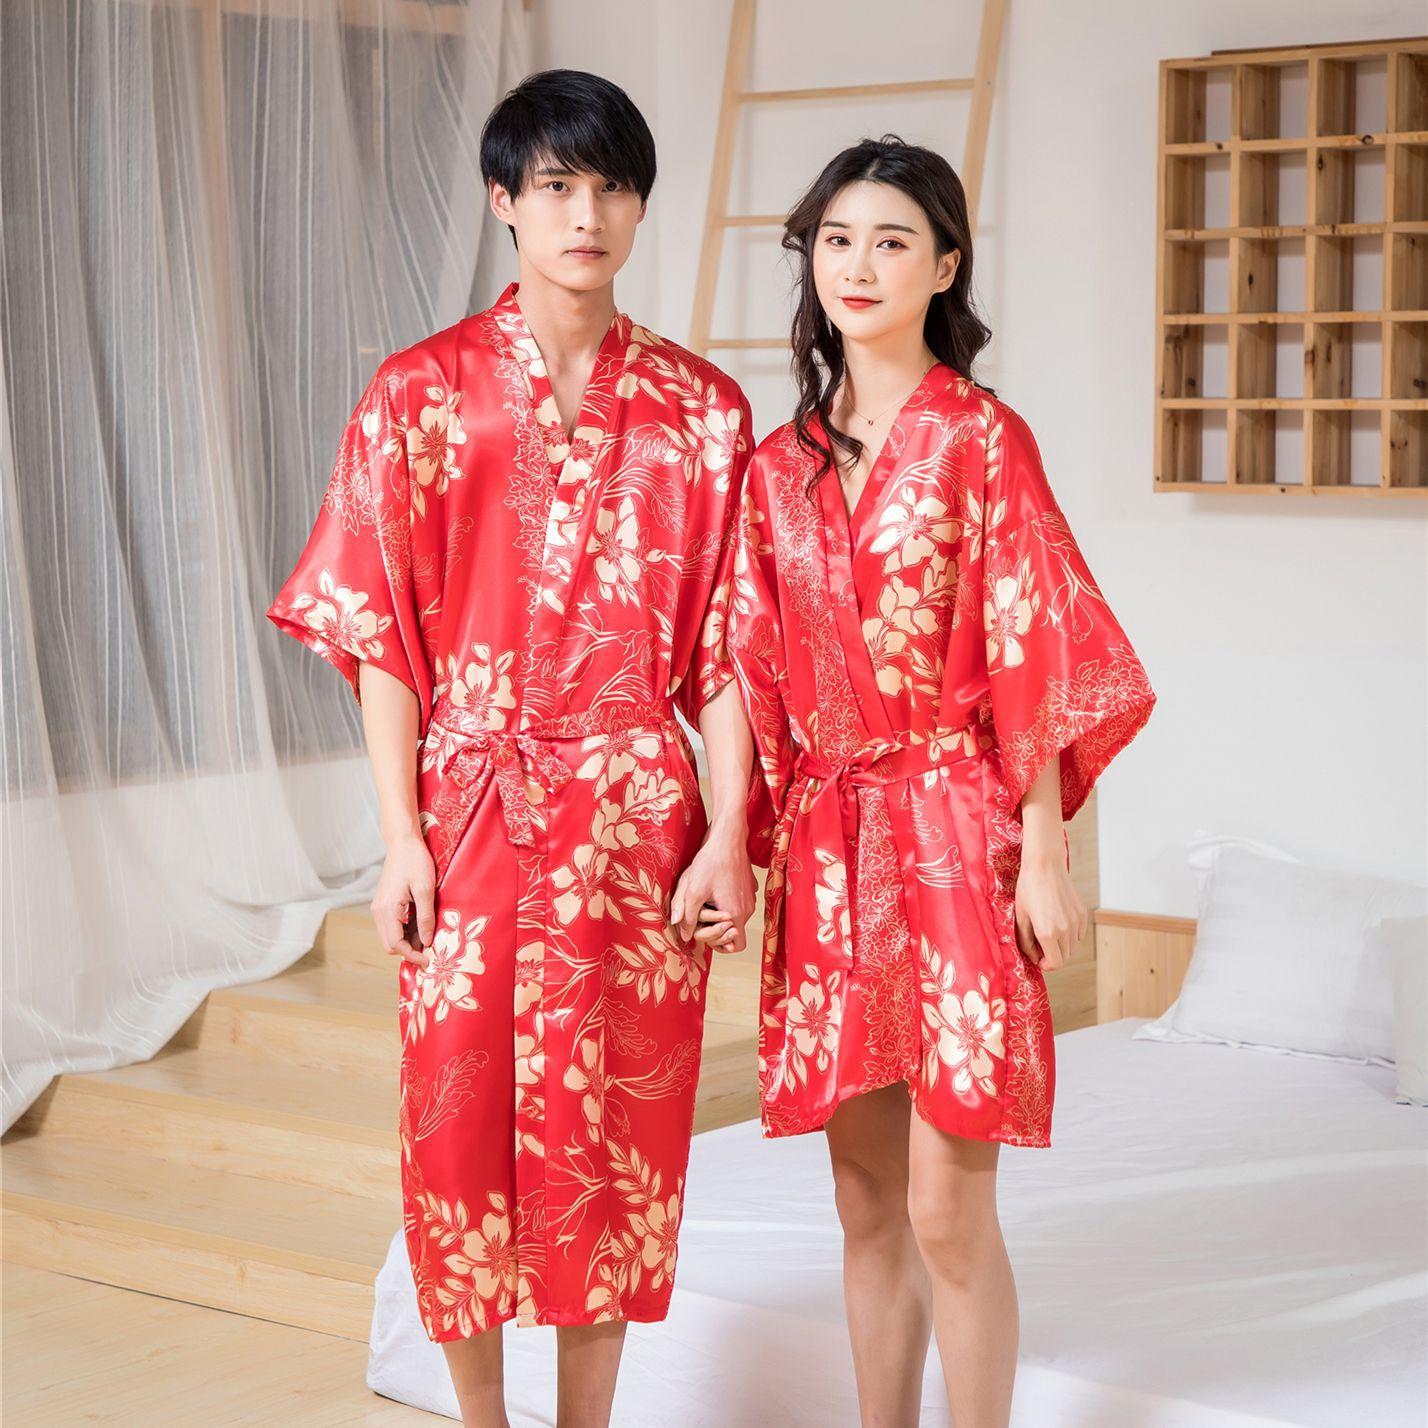 Лето Влюбленные Невеста Свадьба Халат Мужчины Атлас Пижамы Женщины Ночная рубашка Сексуальная Ночная рубашка Леди Кимоно Халат Платье Пеньюары